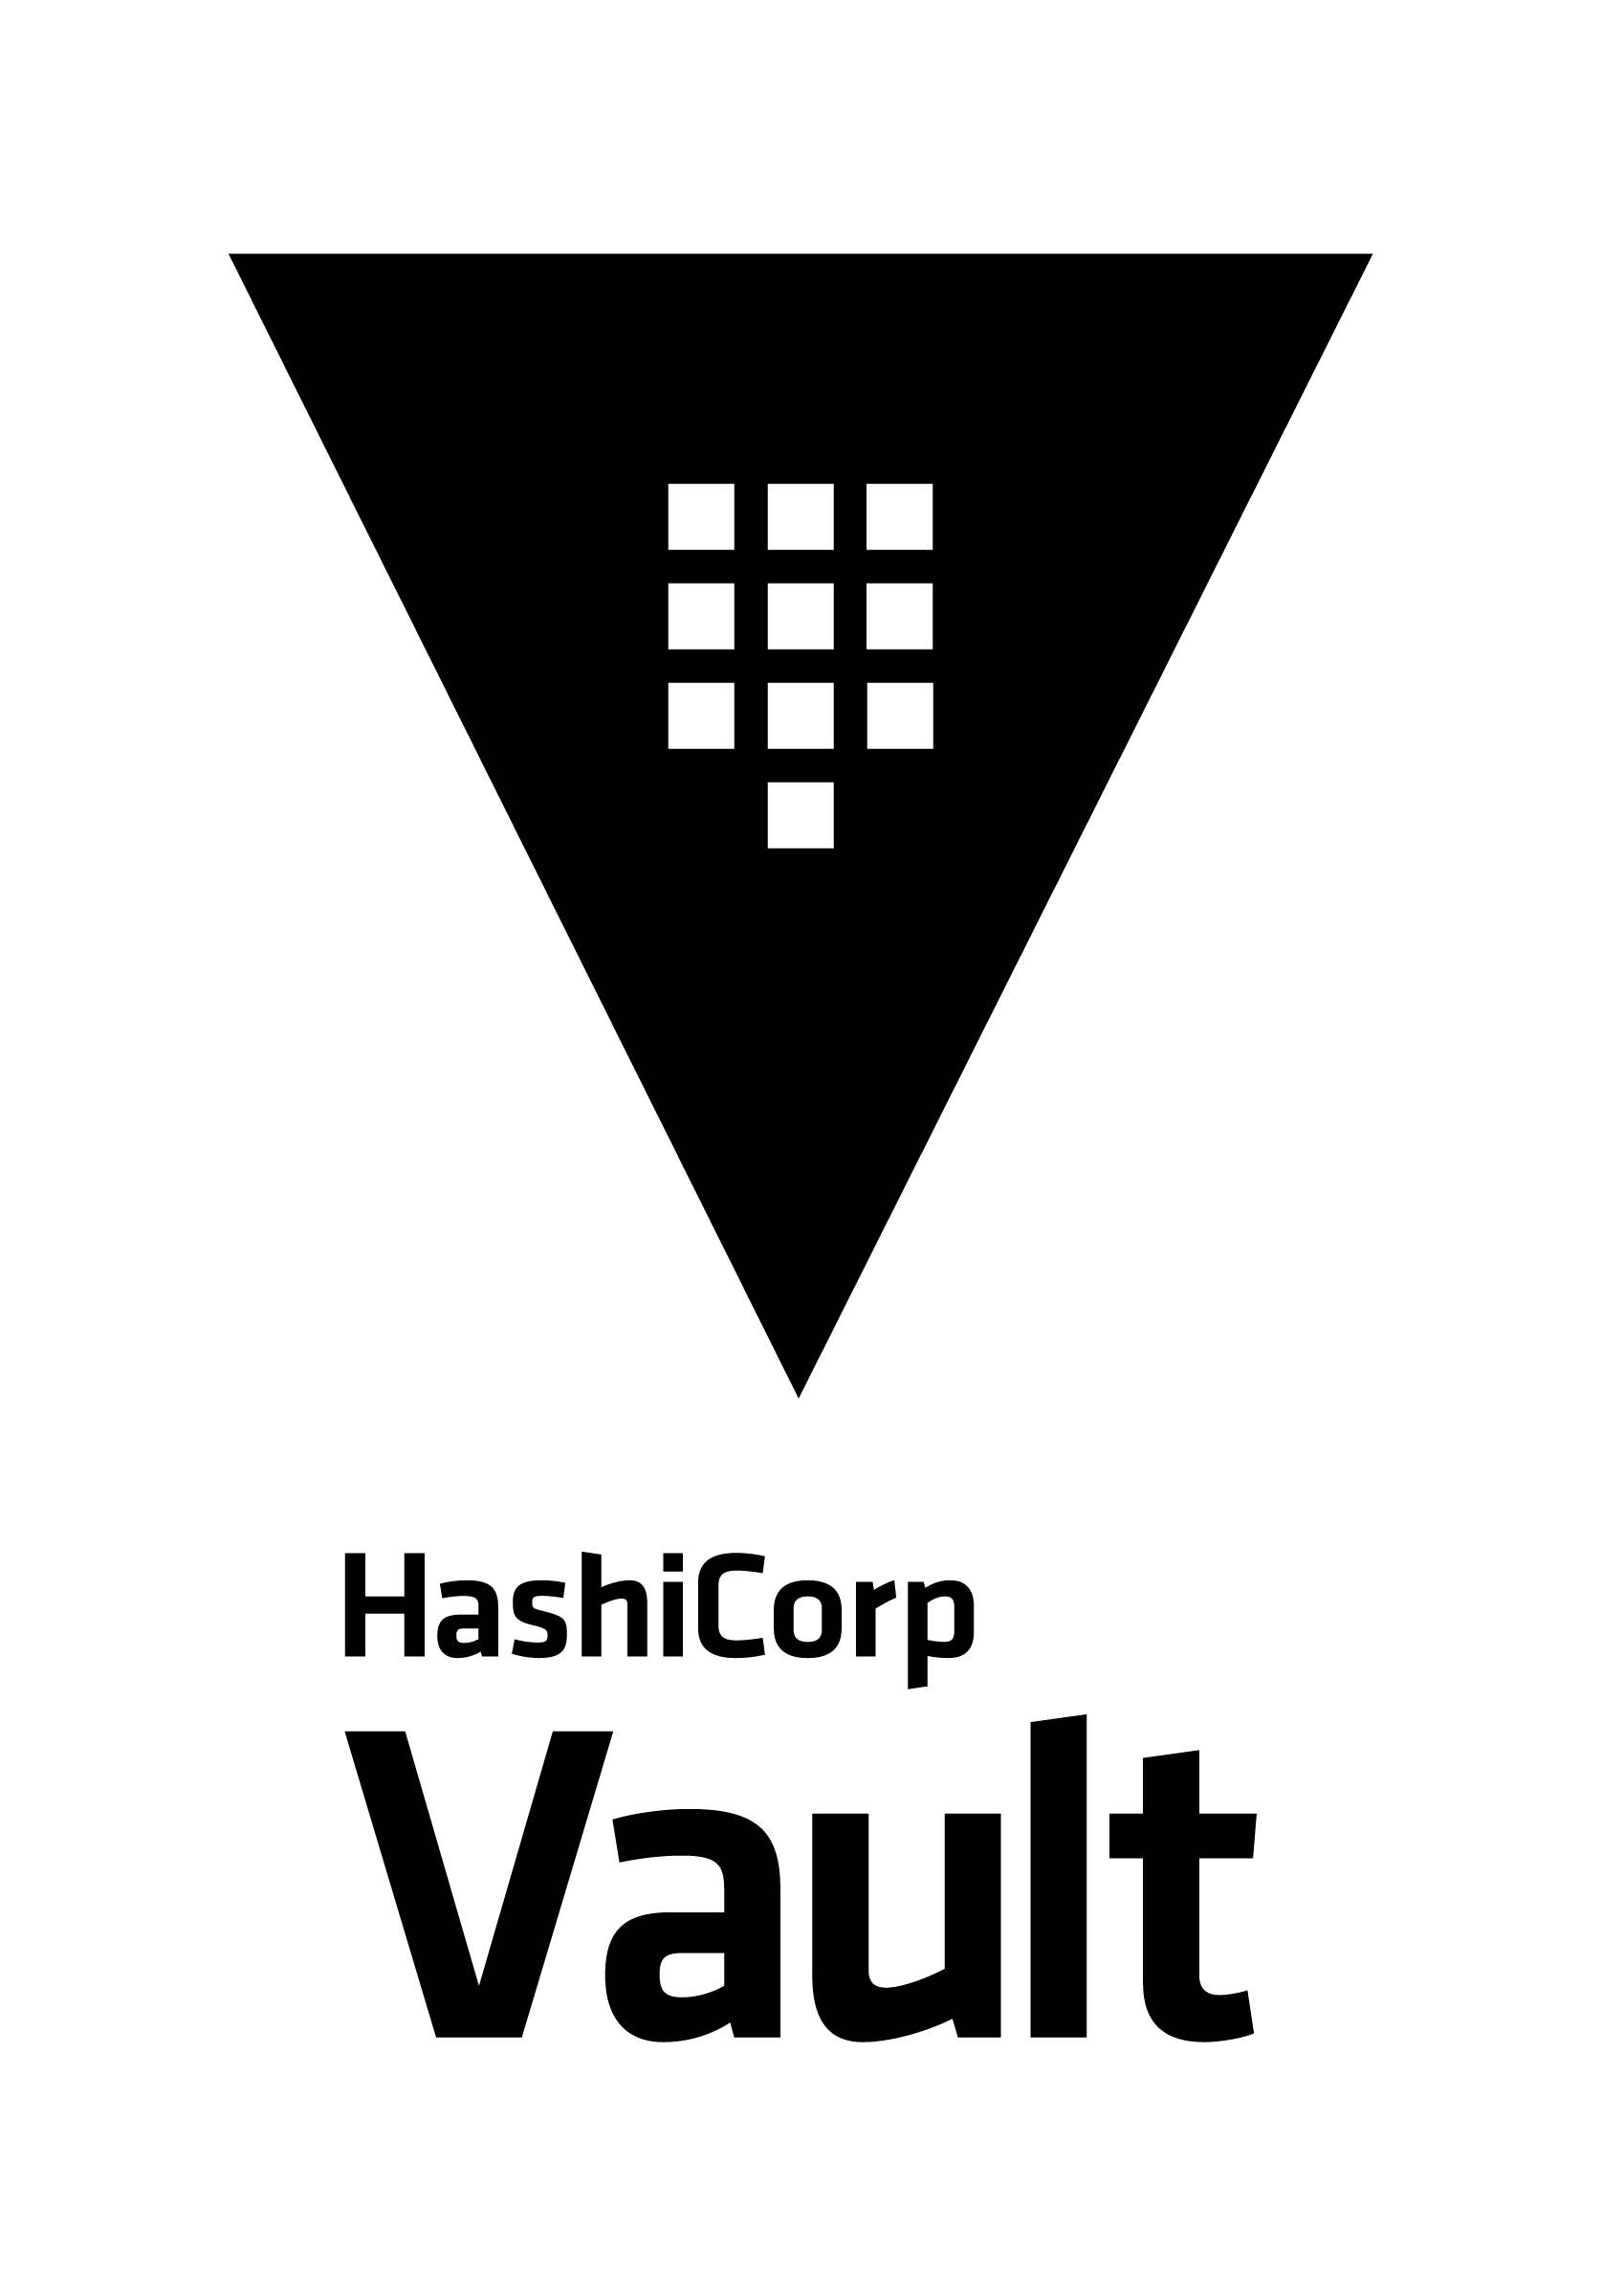 Formation Vault-202 : Intermediate Vault Operations - Image